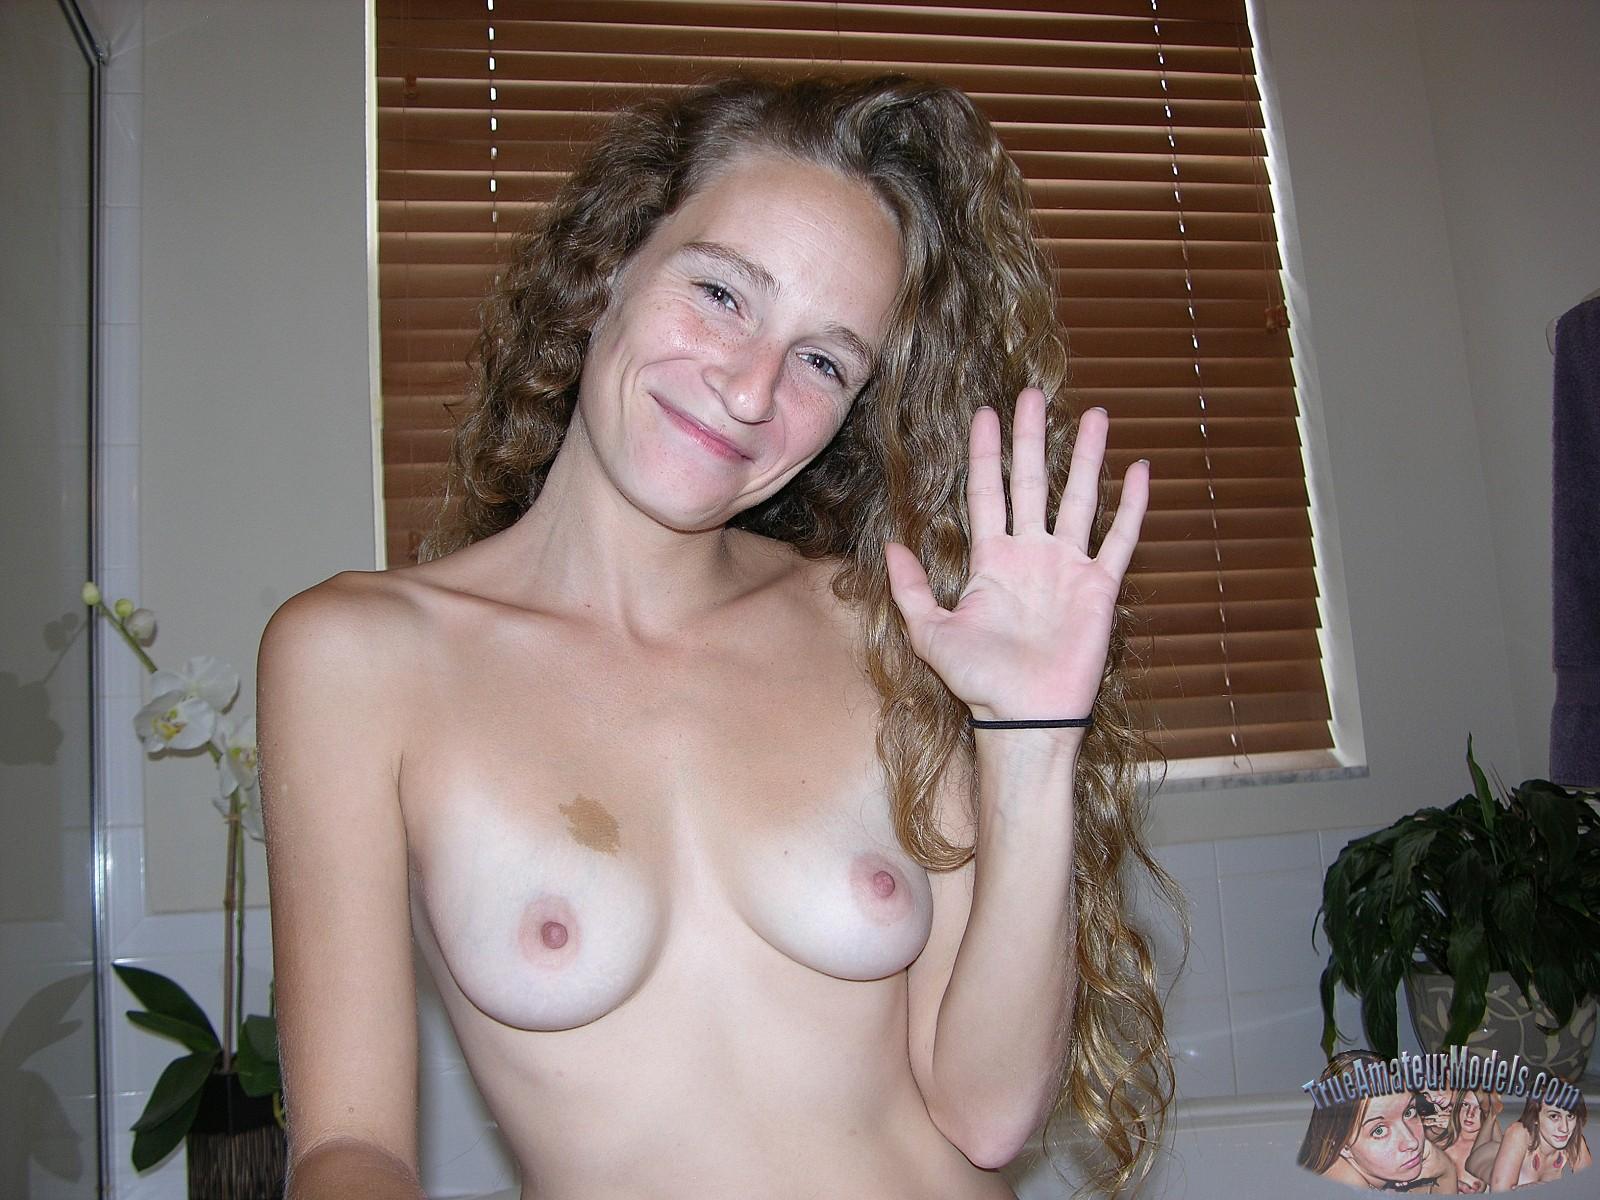 Sexy girl masturbating squirt gif hd